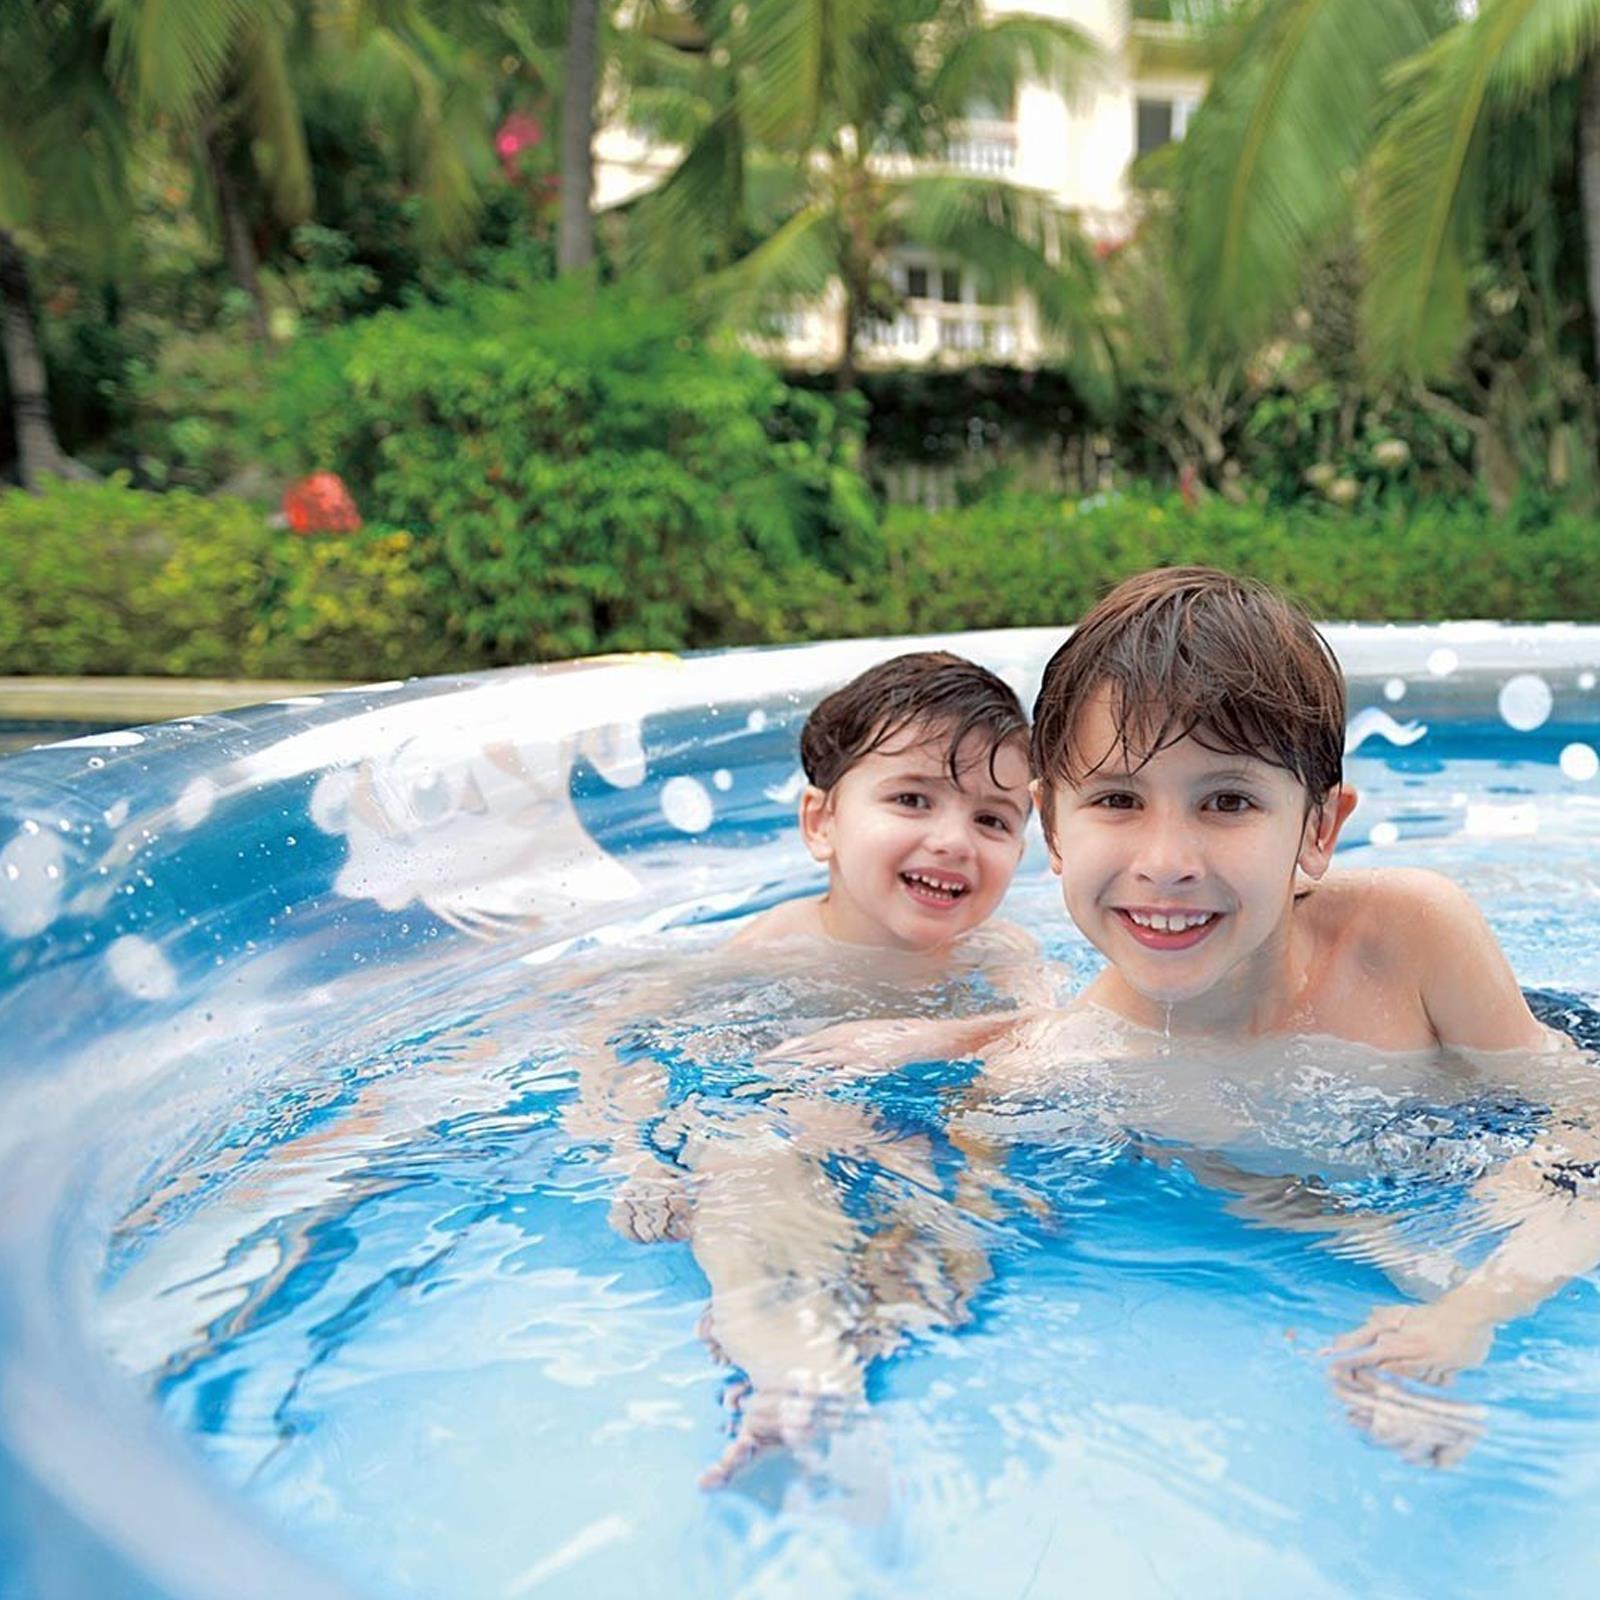 Kids-Play-3-Anillo-Inflable-Centro-De-Natacion-Piscina-Infantil-Mar-Vida-al-Aire-Libre-Diversion miniatura 7